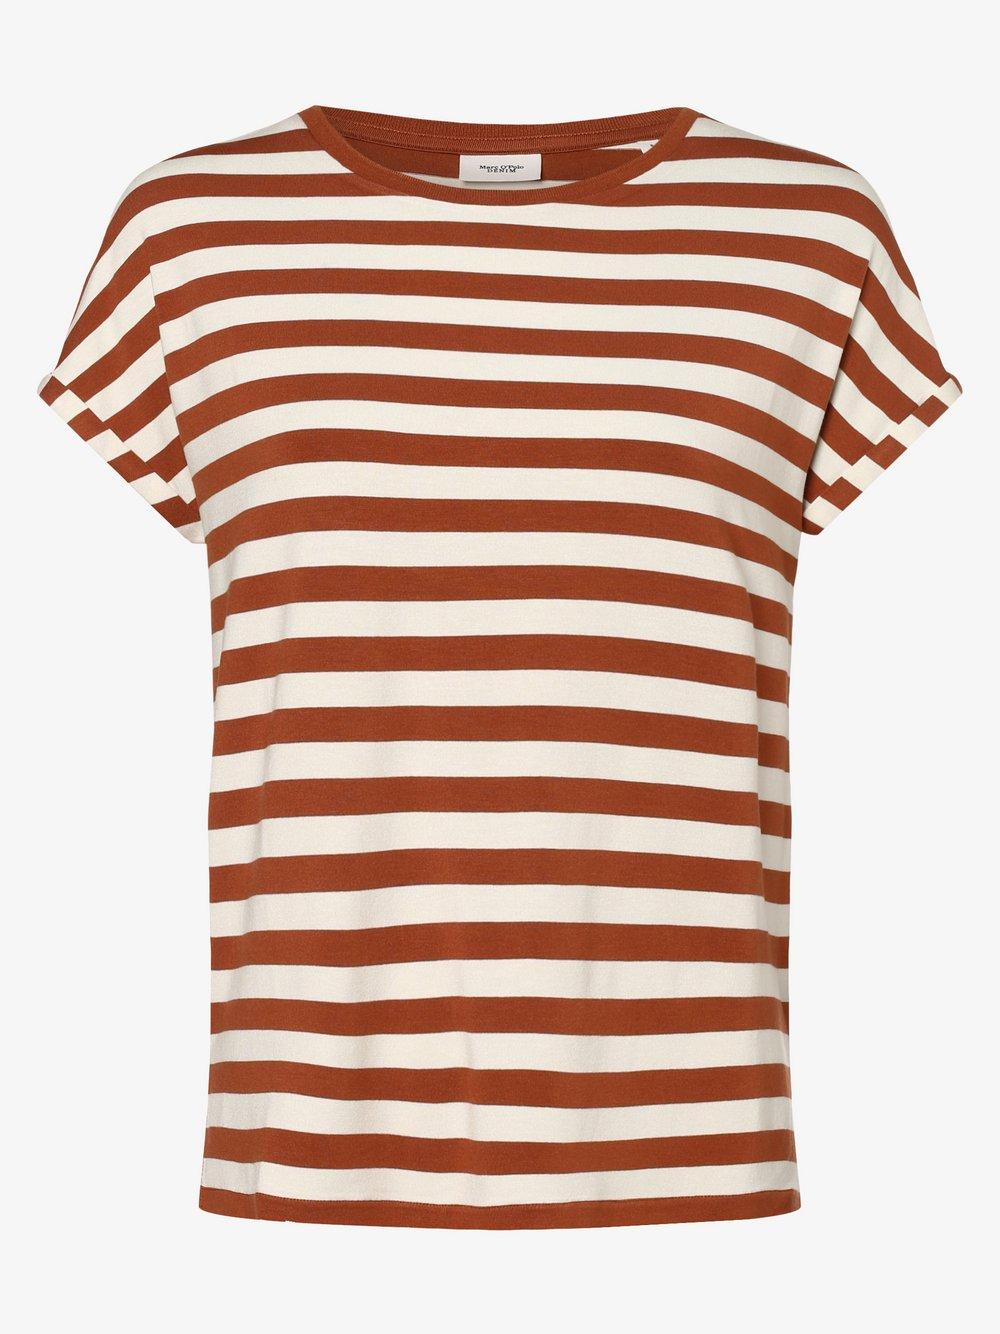 Marc O'Polo Denim – T-shirt damski, brązowy Van Graaf 488444-0002-09900